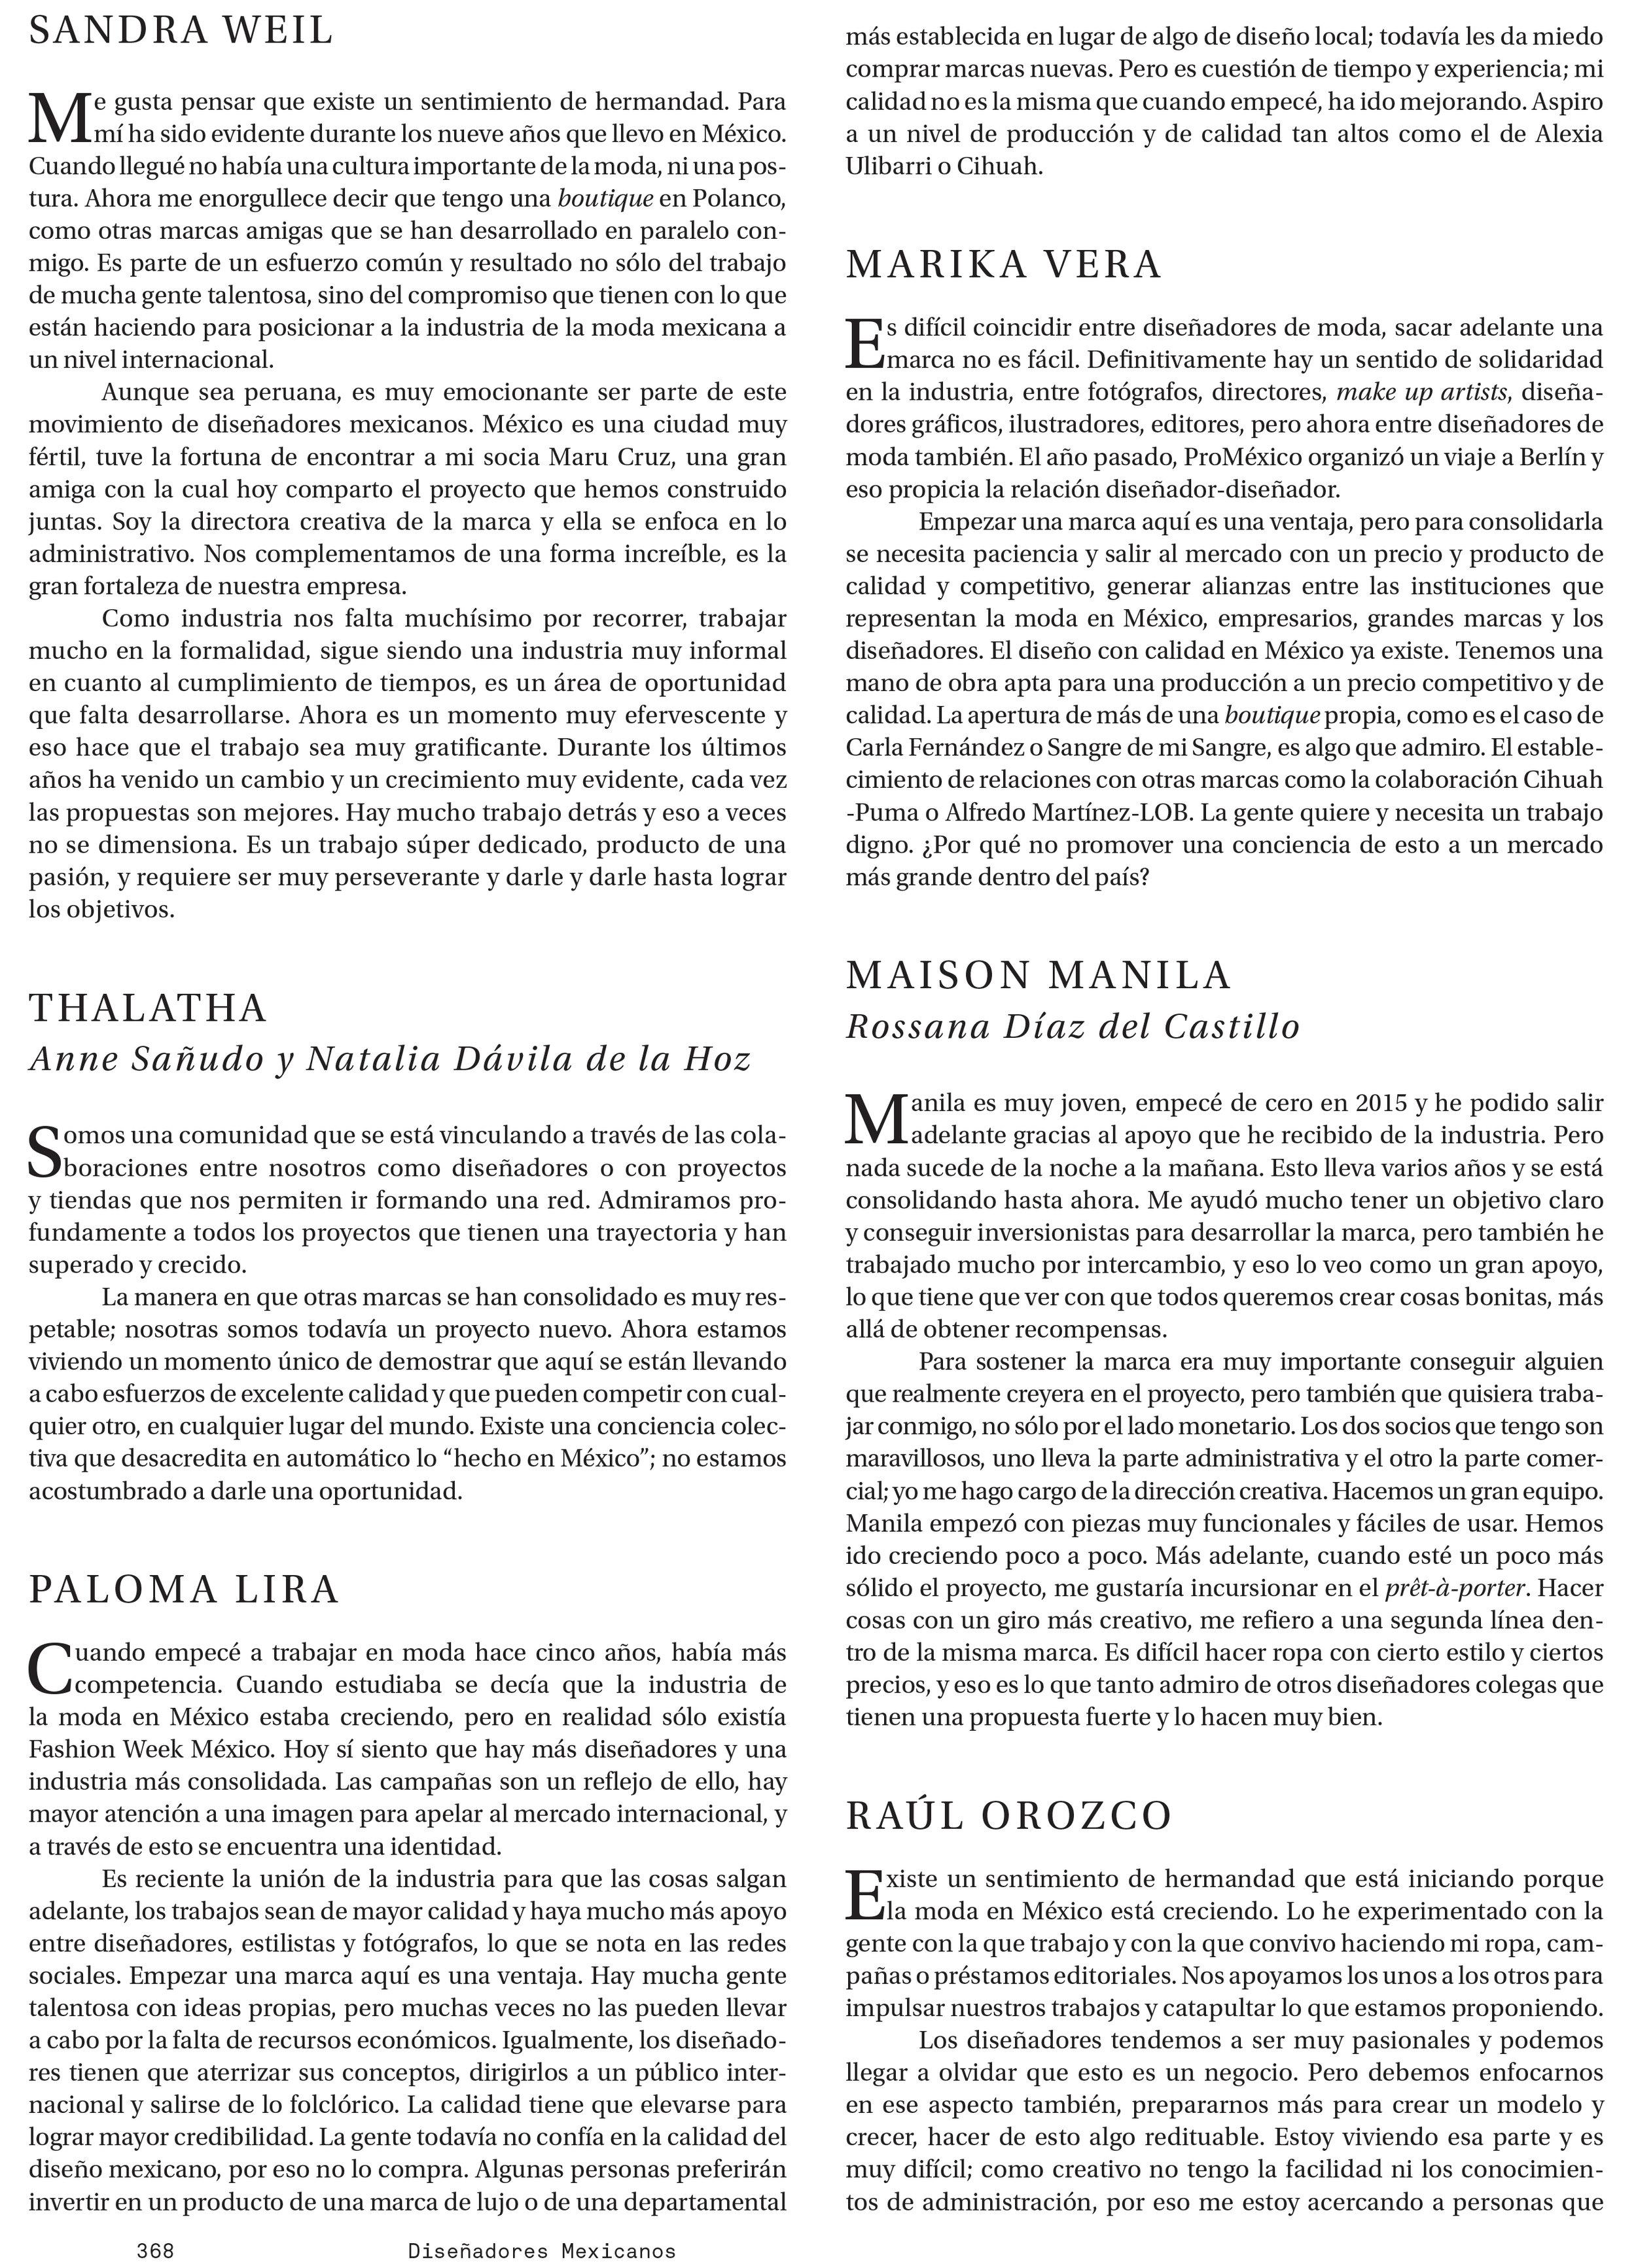 DISEÑADORES MEXICANOS-15.jpg